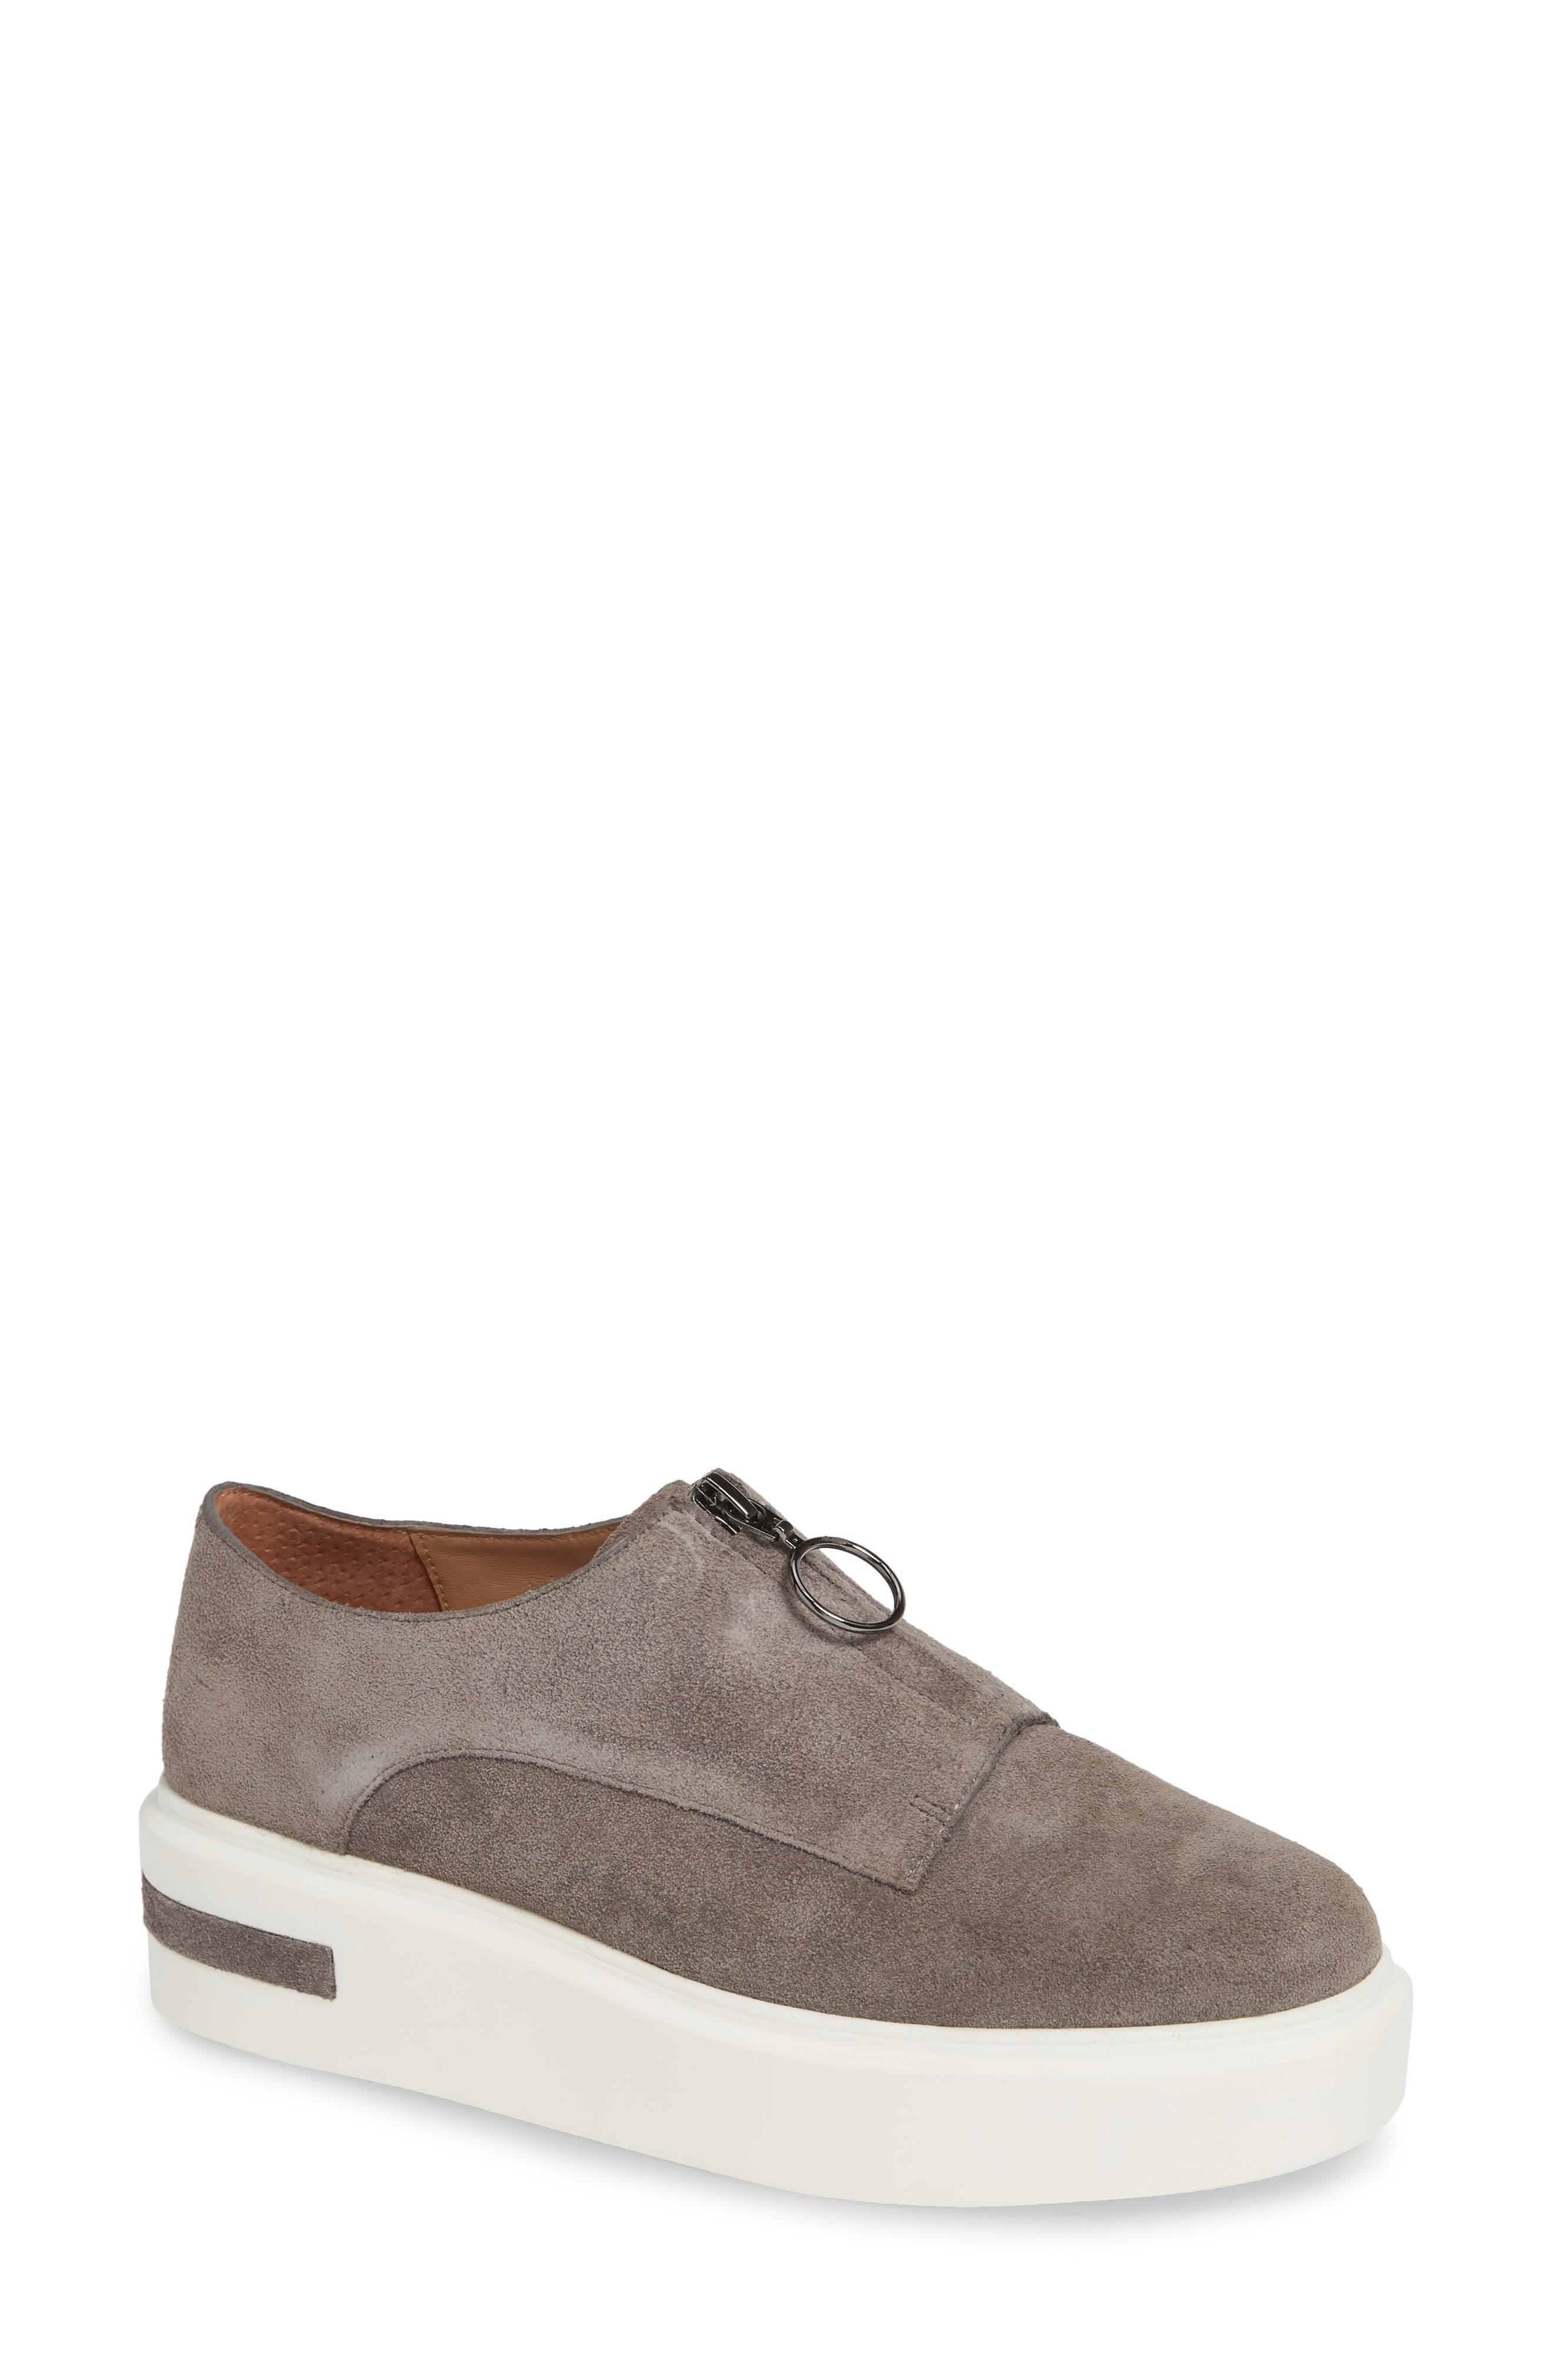 LINEA PAOLO, Kelani Platform Sneaker, Main thumbnail 1, color, STONE SUEDE